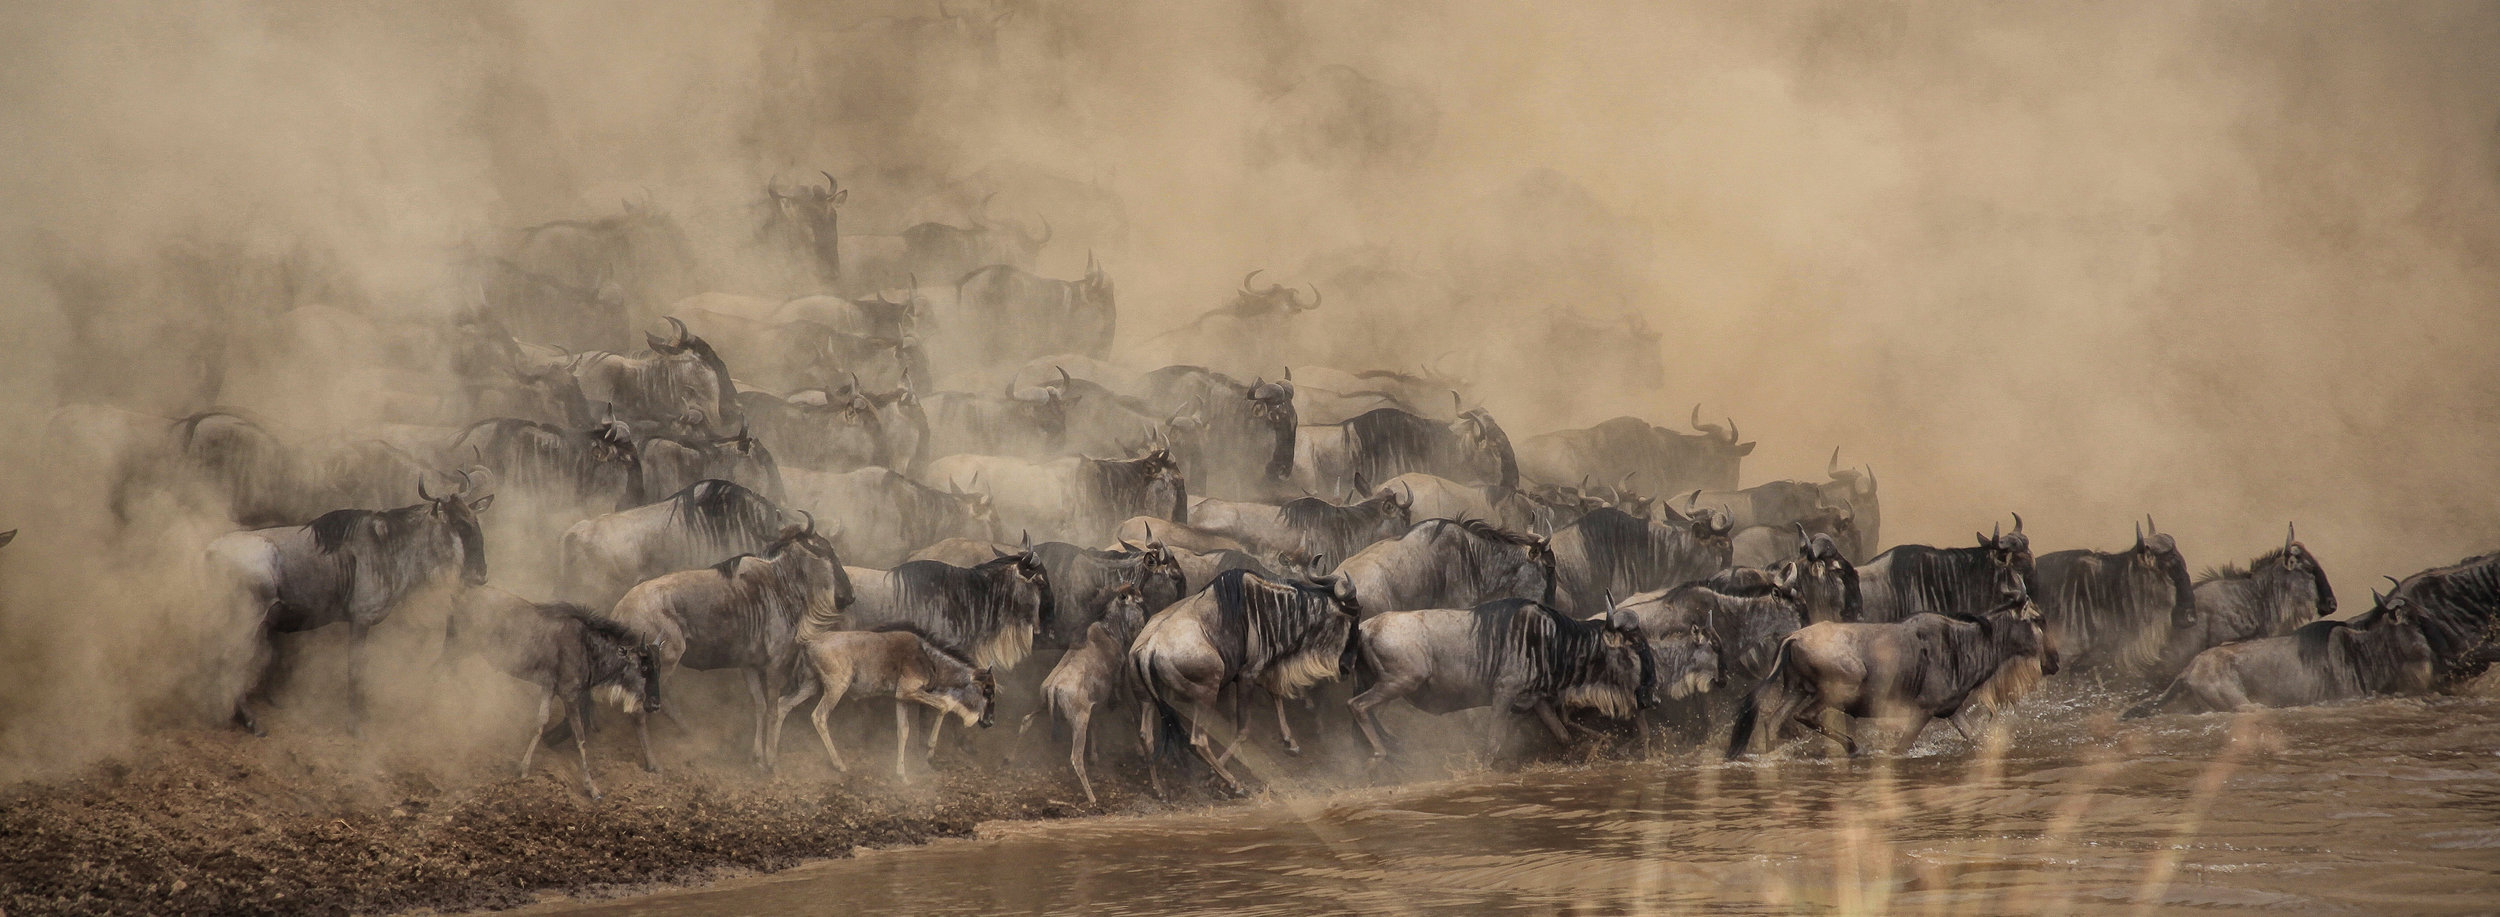 herd-Herde-Anpassung-Flexibilität-flexibility